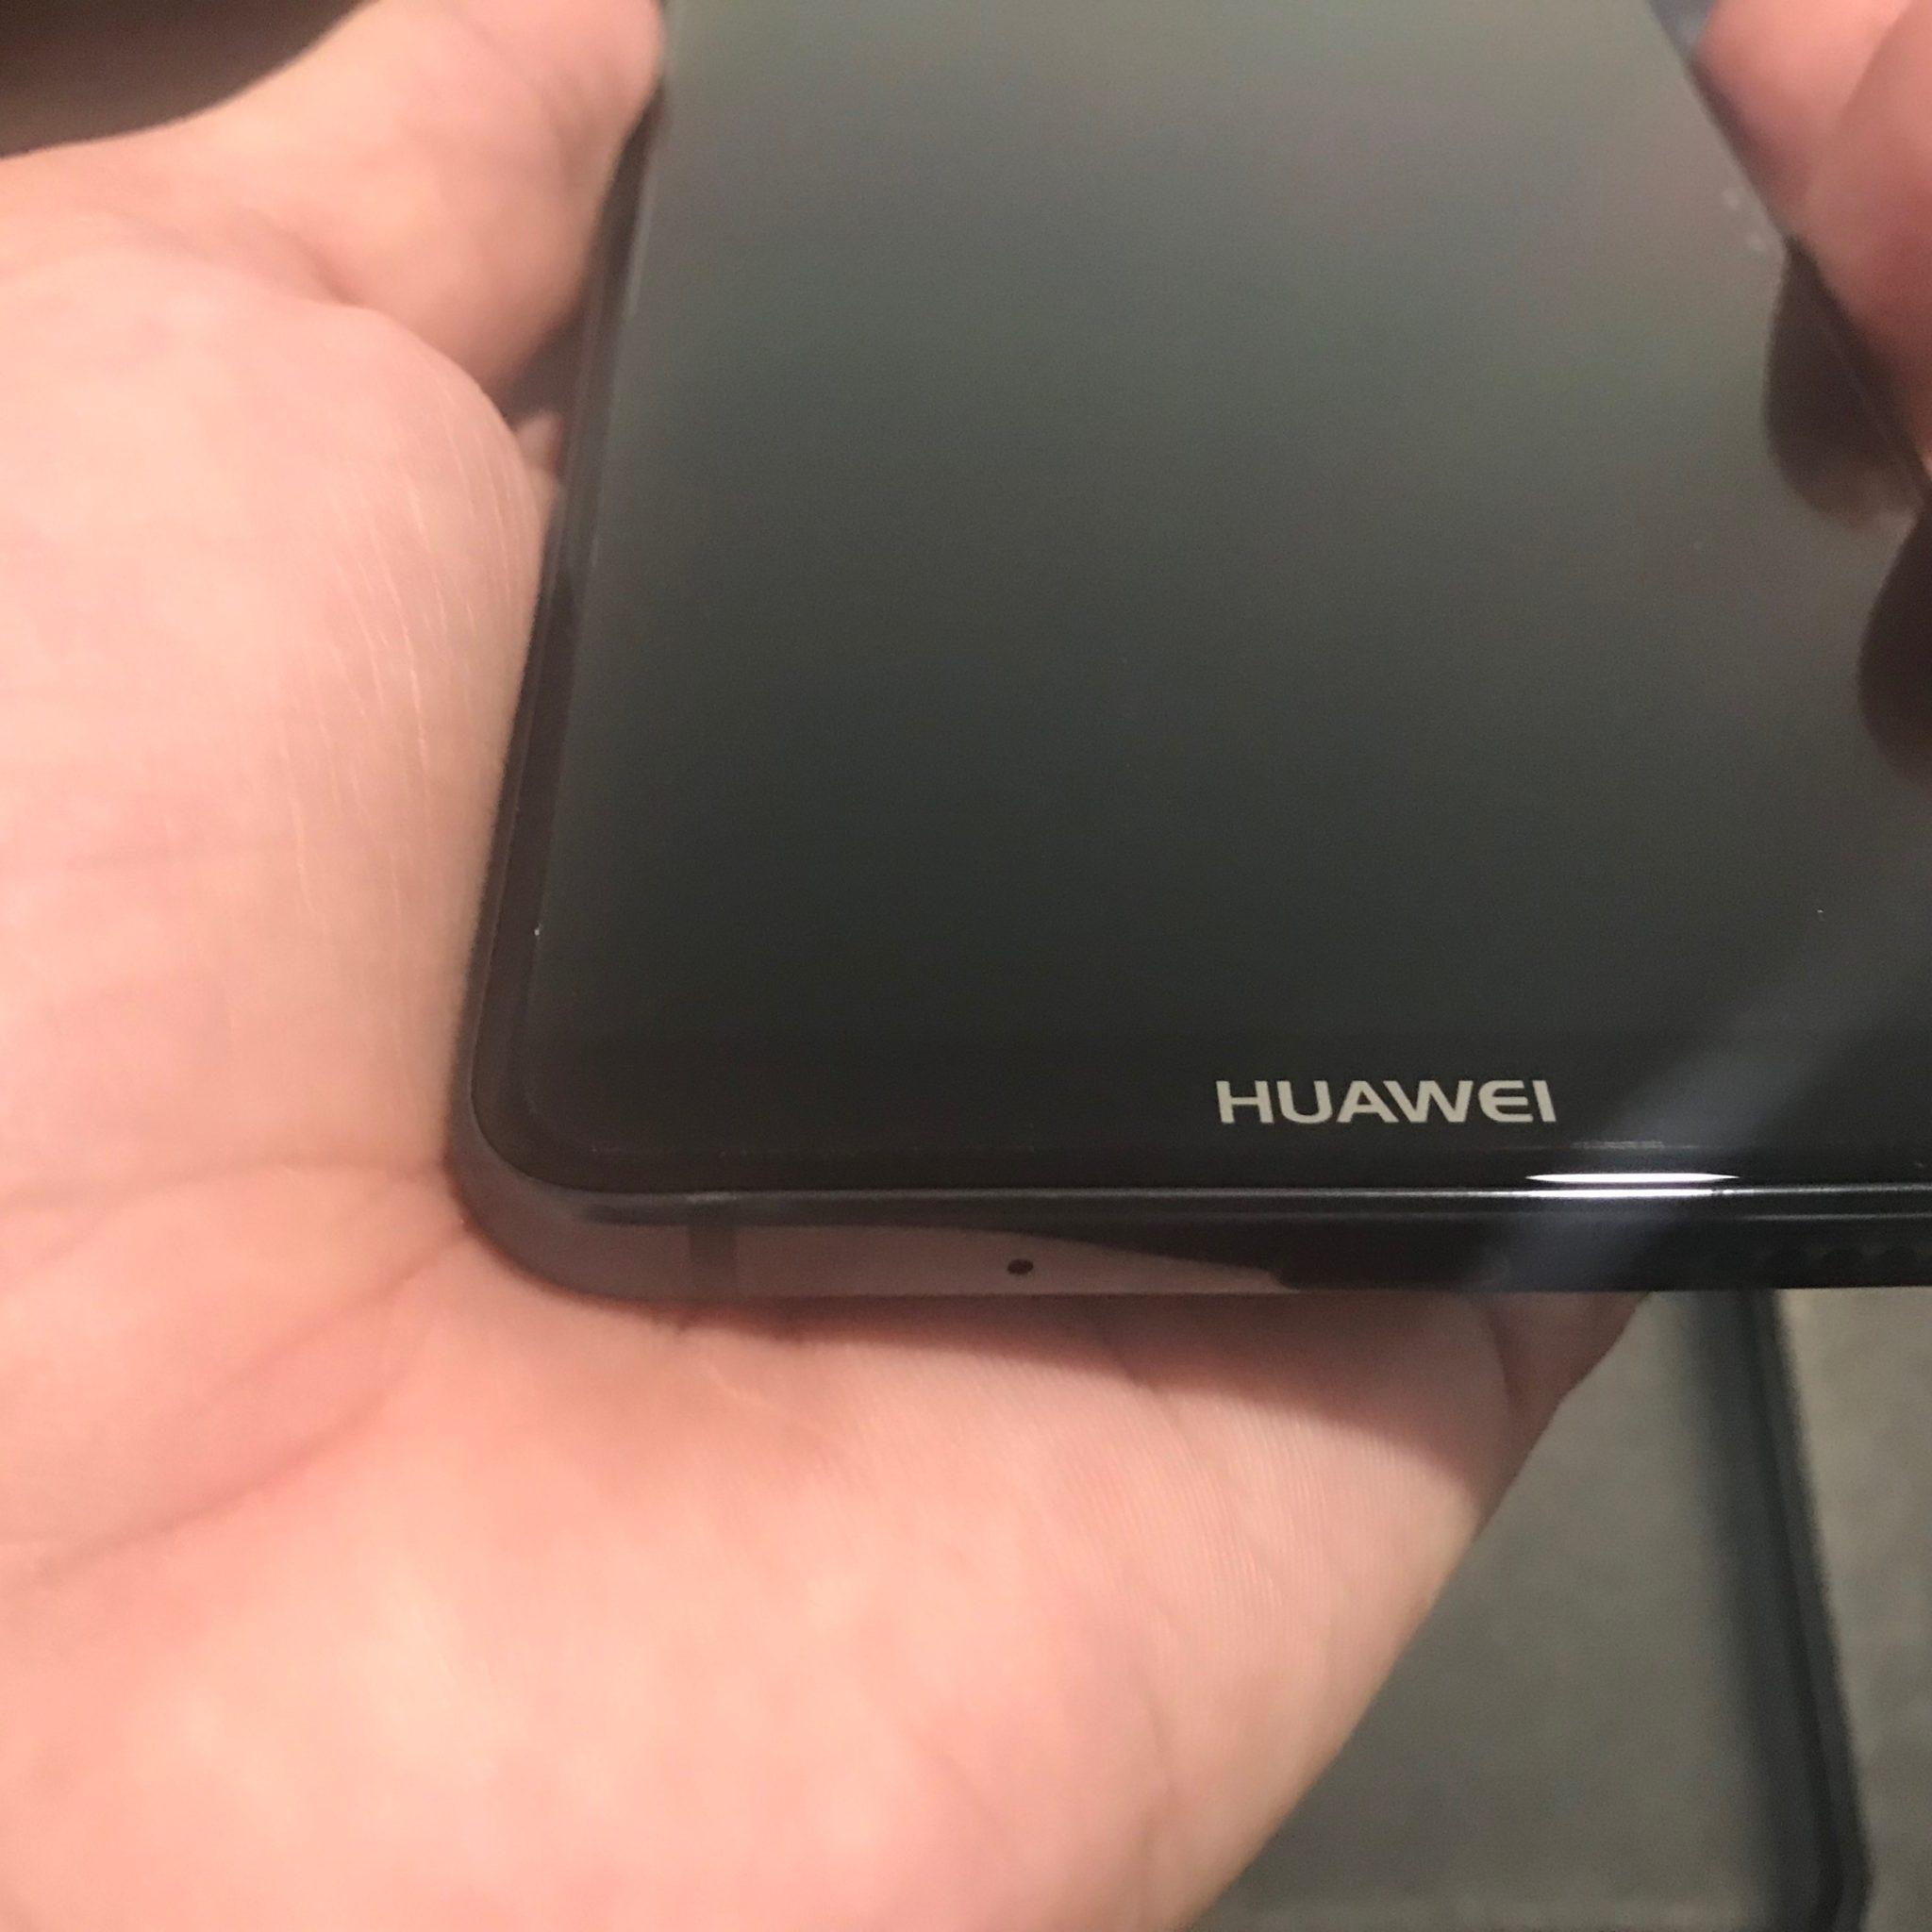 [REVIEW] Huawei Mate 10 Pro – O bestie interesanta si impresionanta!